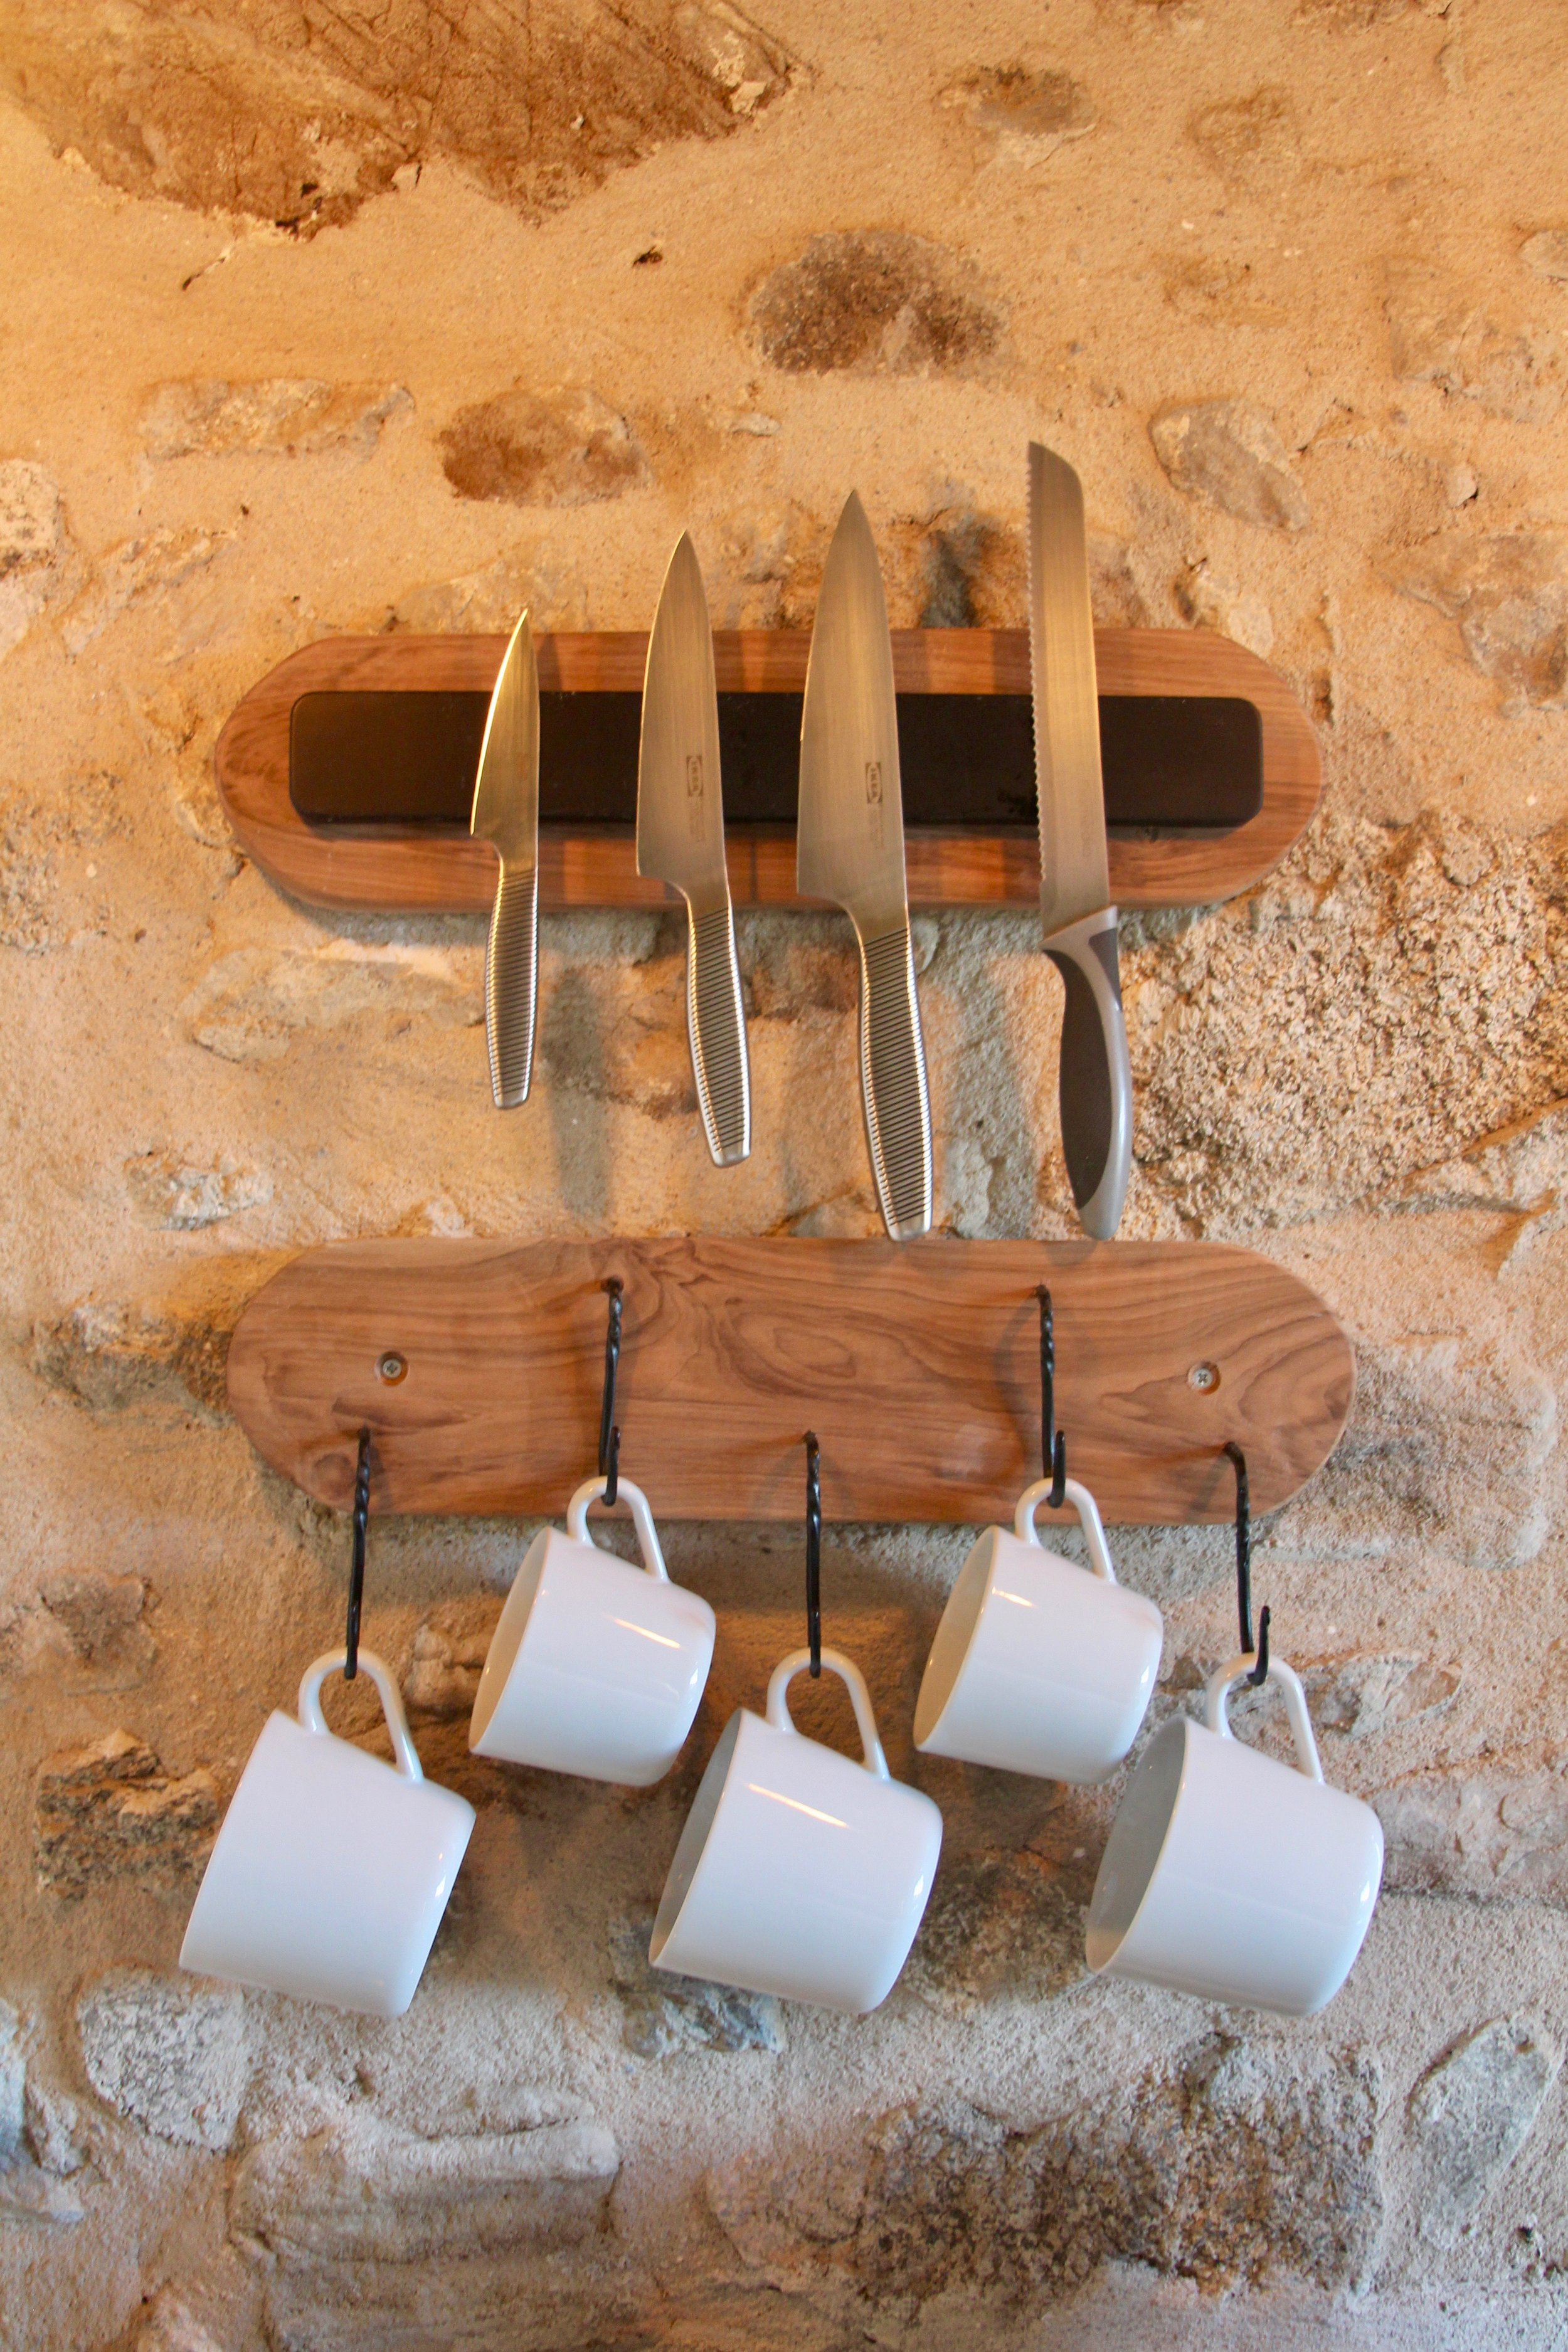 Knife magnet & mug rack